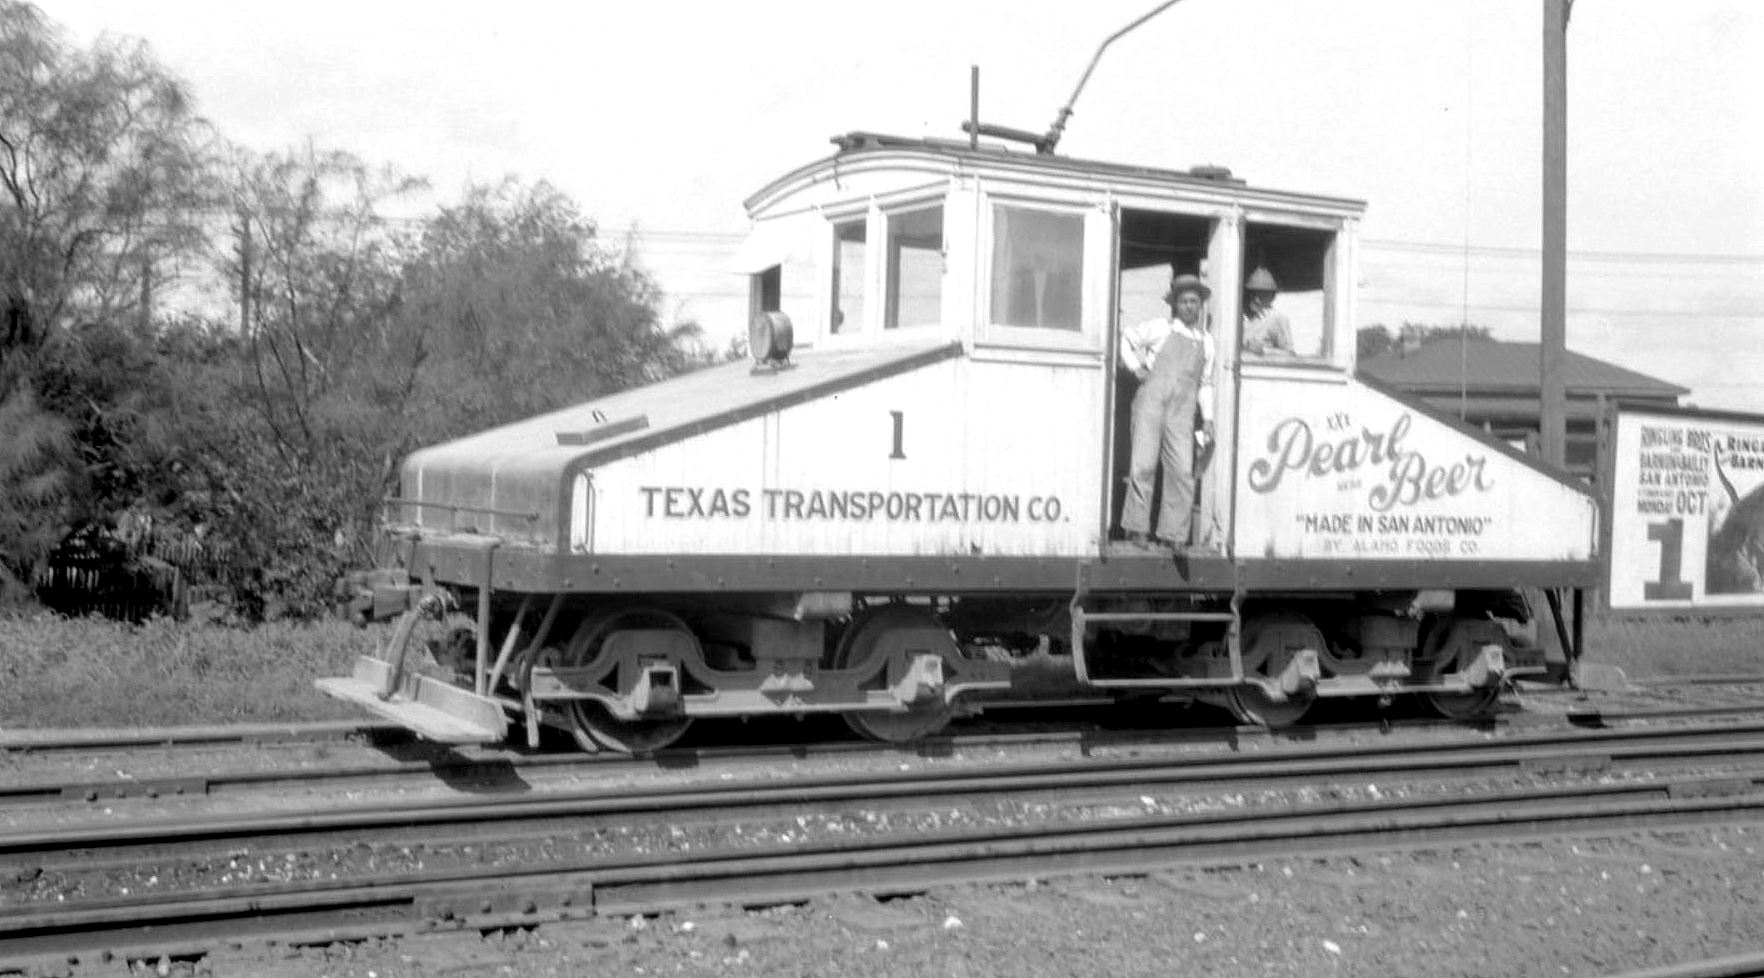 texas-transportation-co_1928_denver-public-library